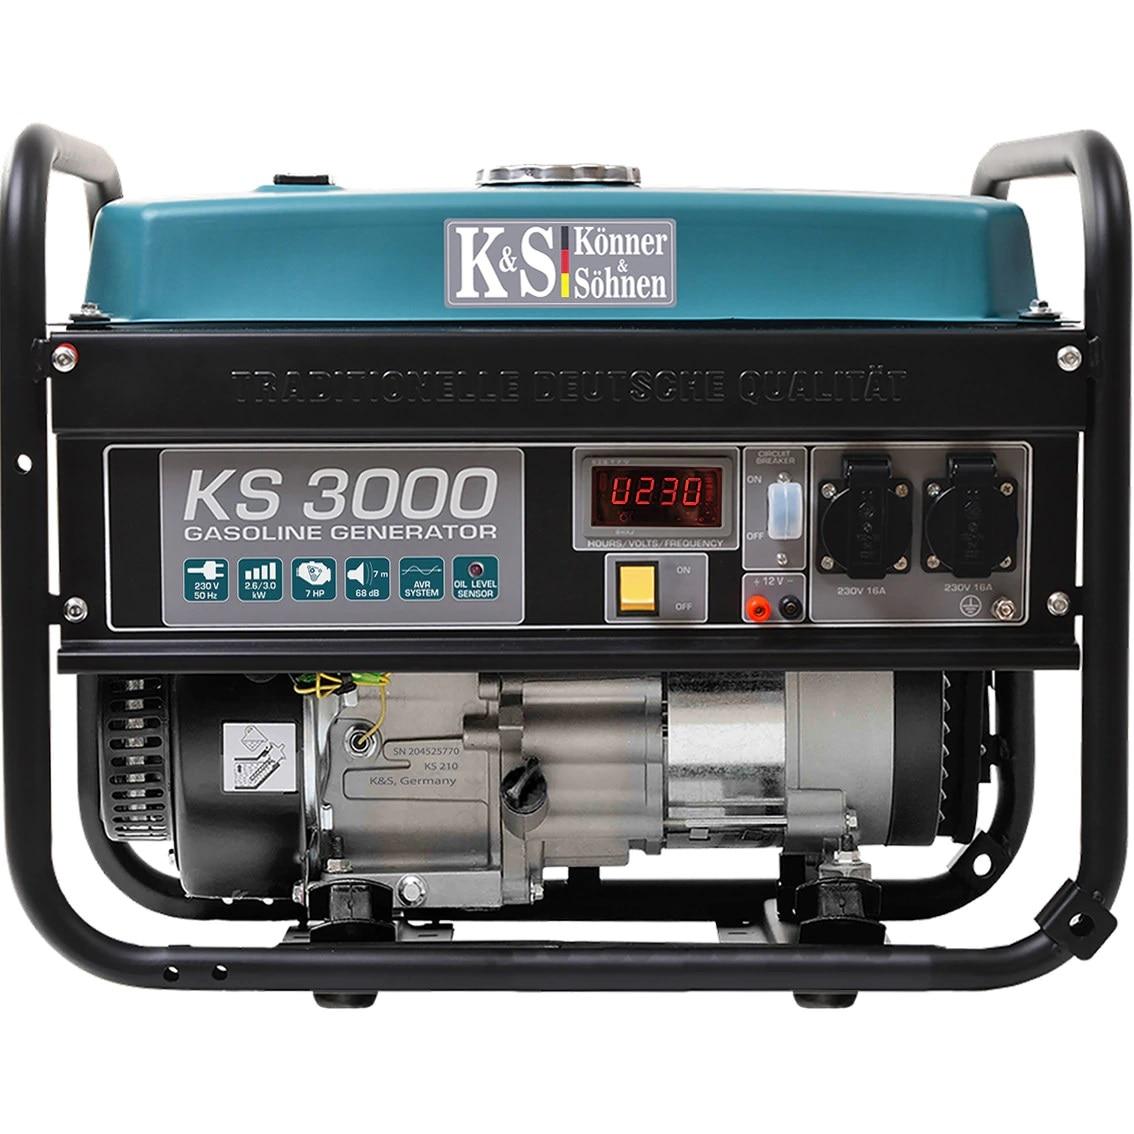 Fotografie Generator curent electric Könner&Söhnen KS 3000, 7 CP, 3000 W, easy start, 2 x 230 V, 1 x 12 V, protectie suprasarcina, 15 h autonomie maxima, benzina